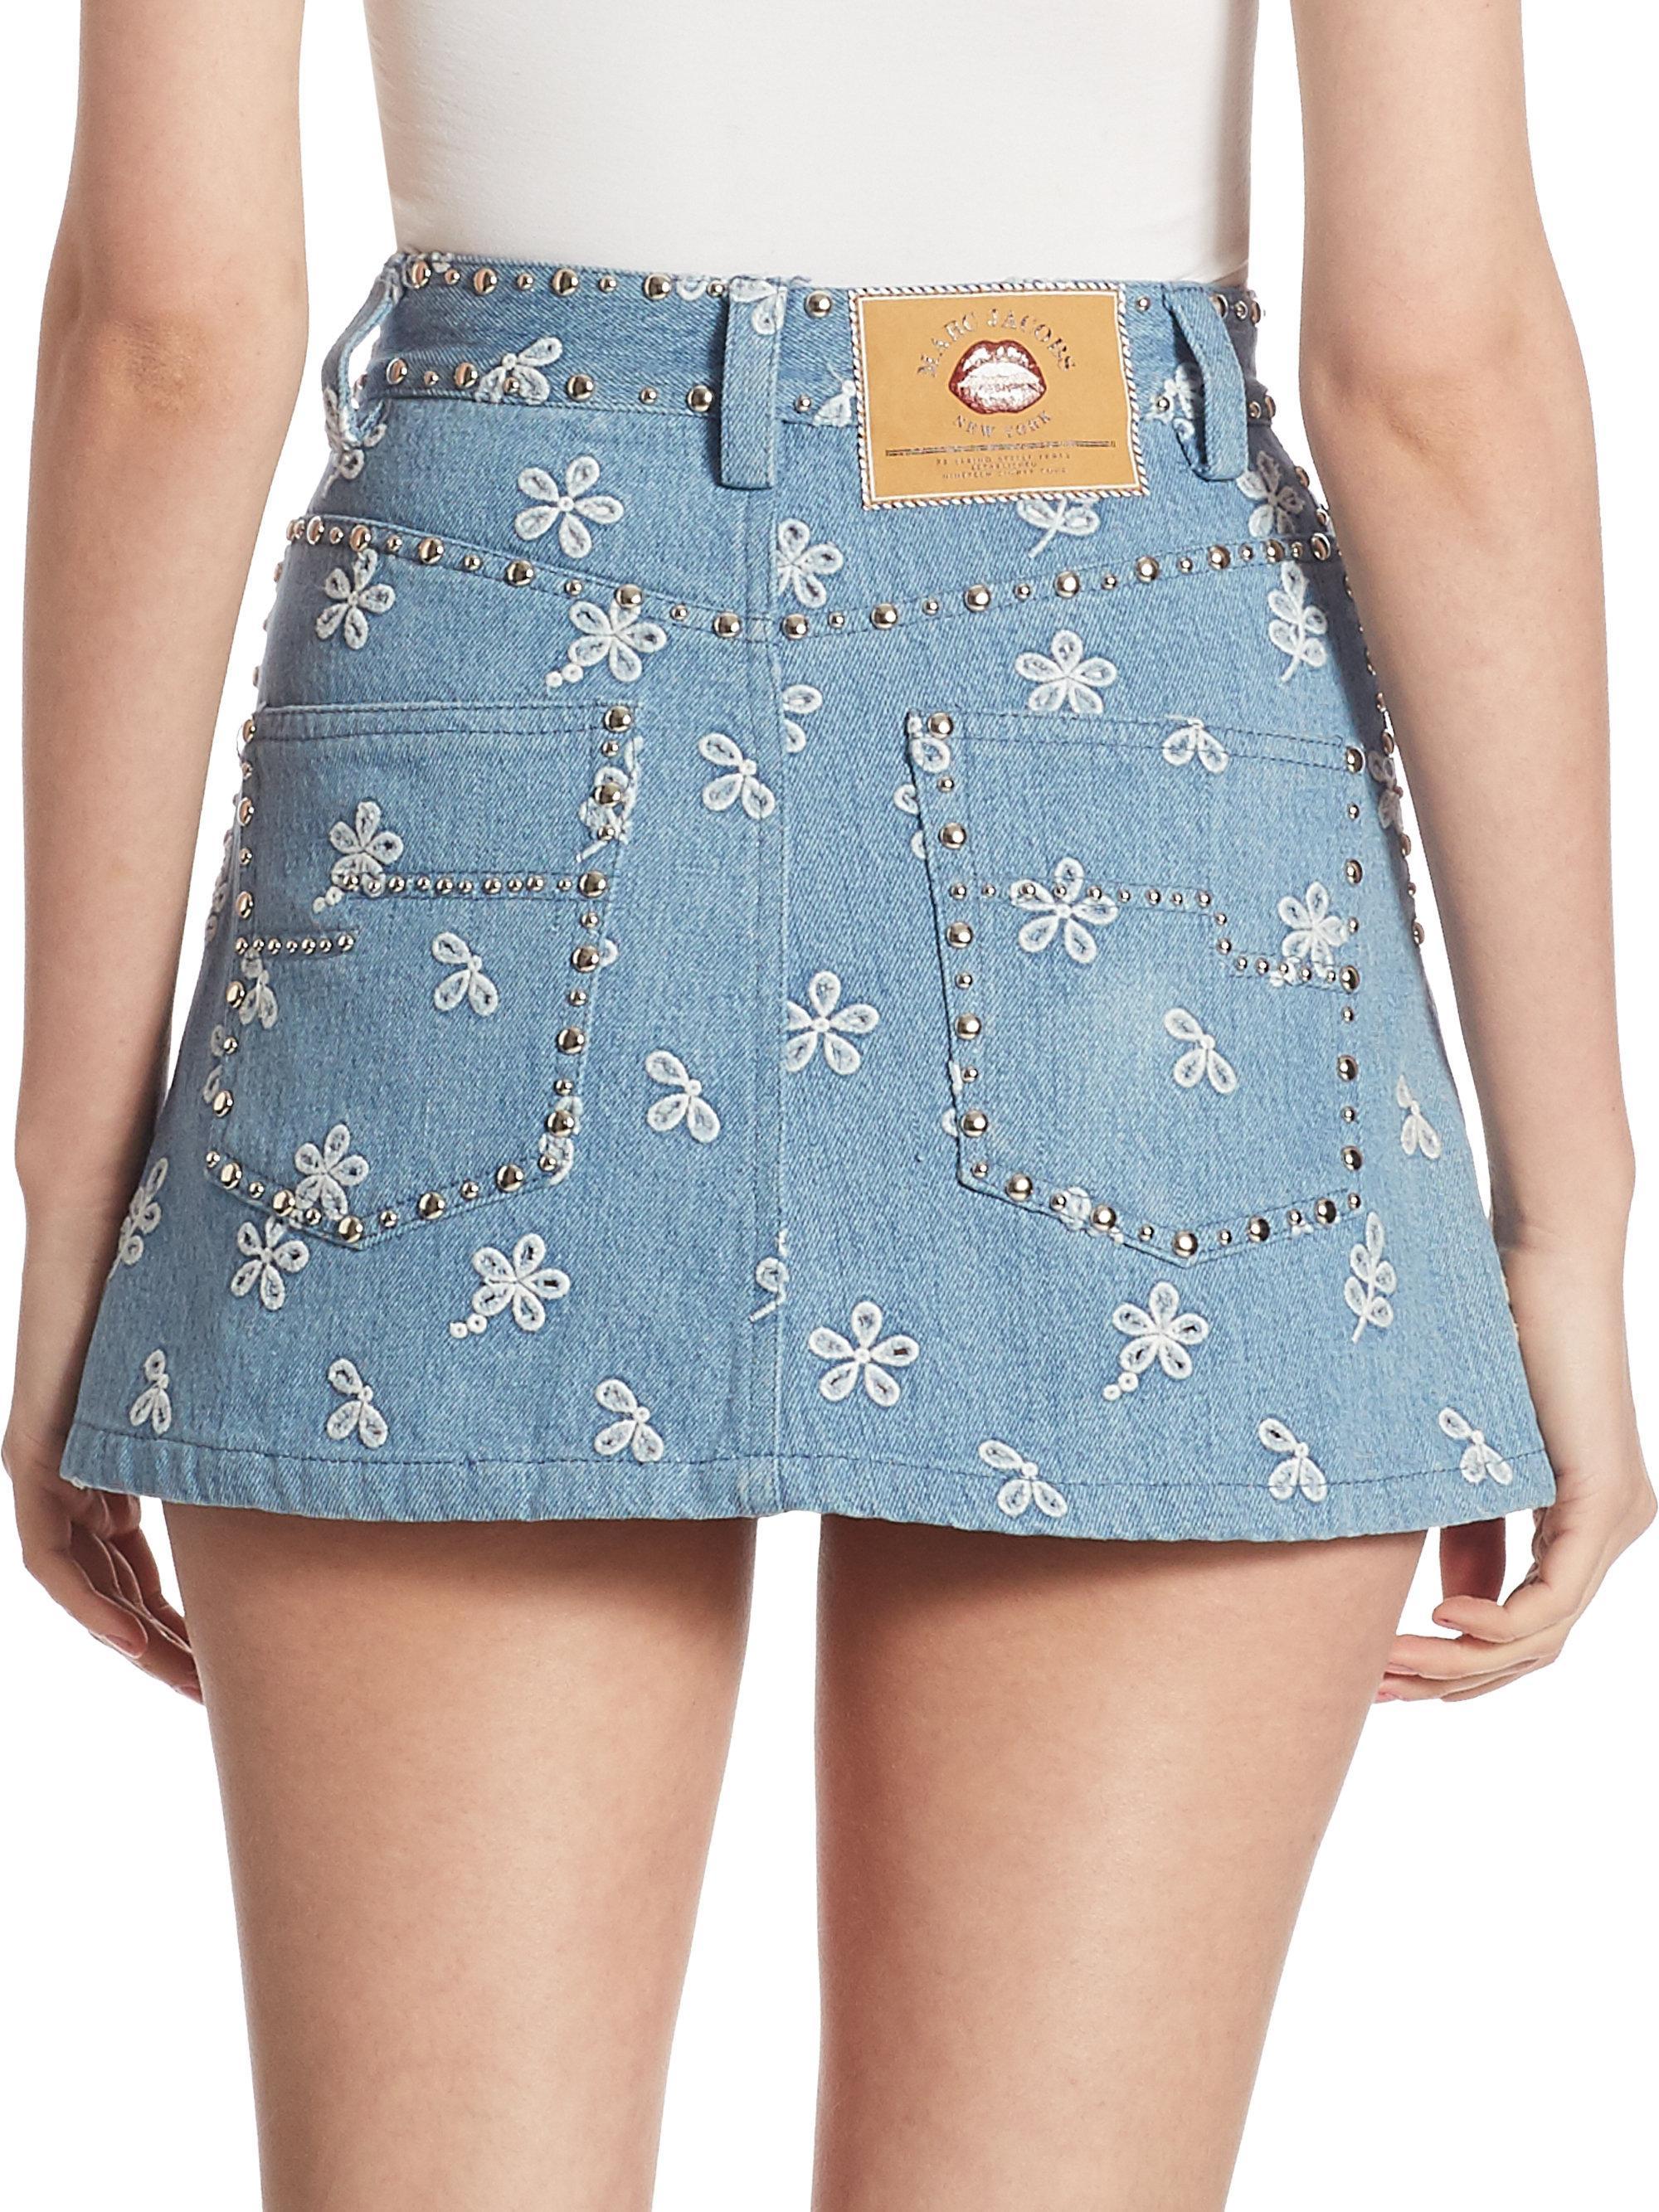 df64cb58ce Lyst - Marc Jacobs Studded Denim Mini Skirt in Blue